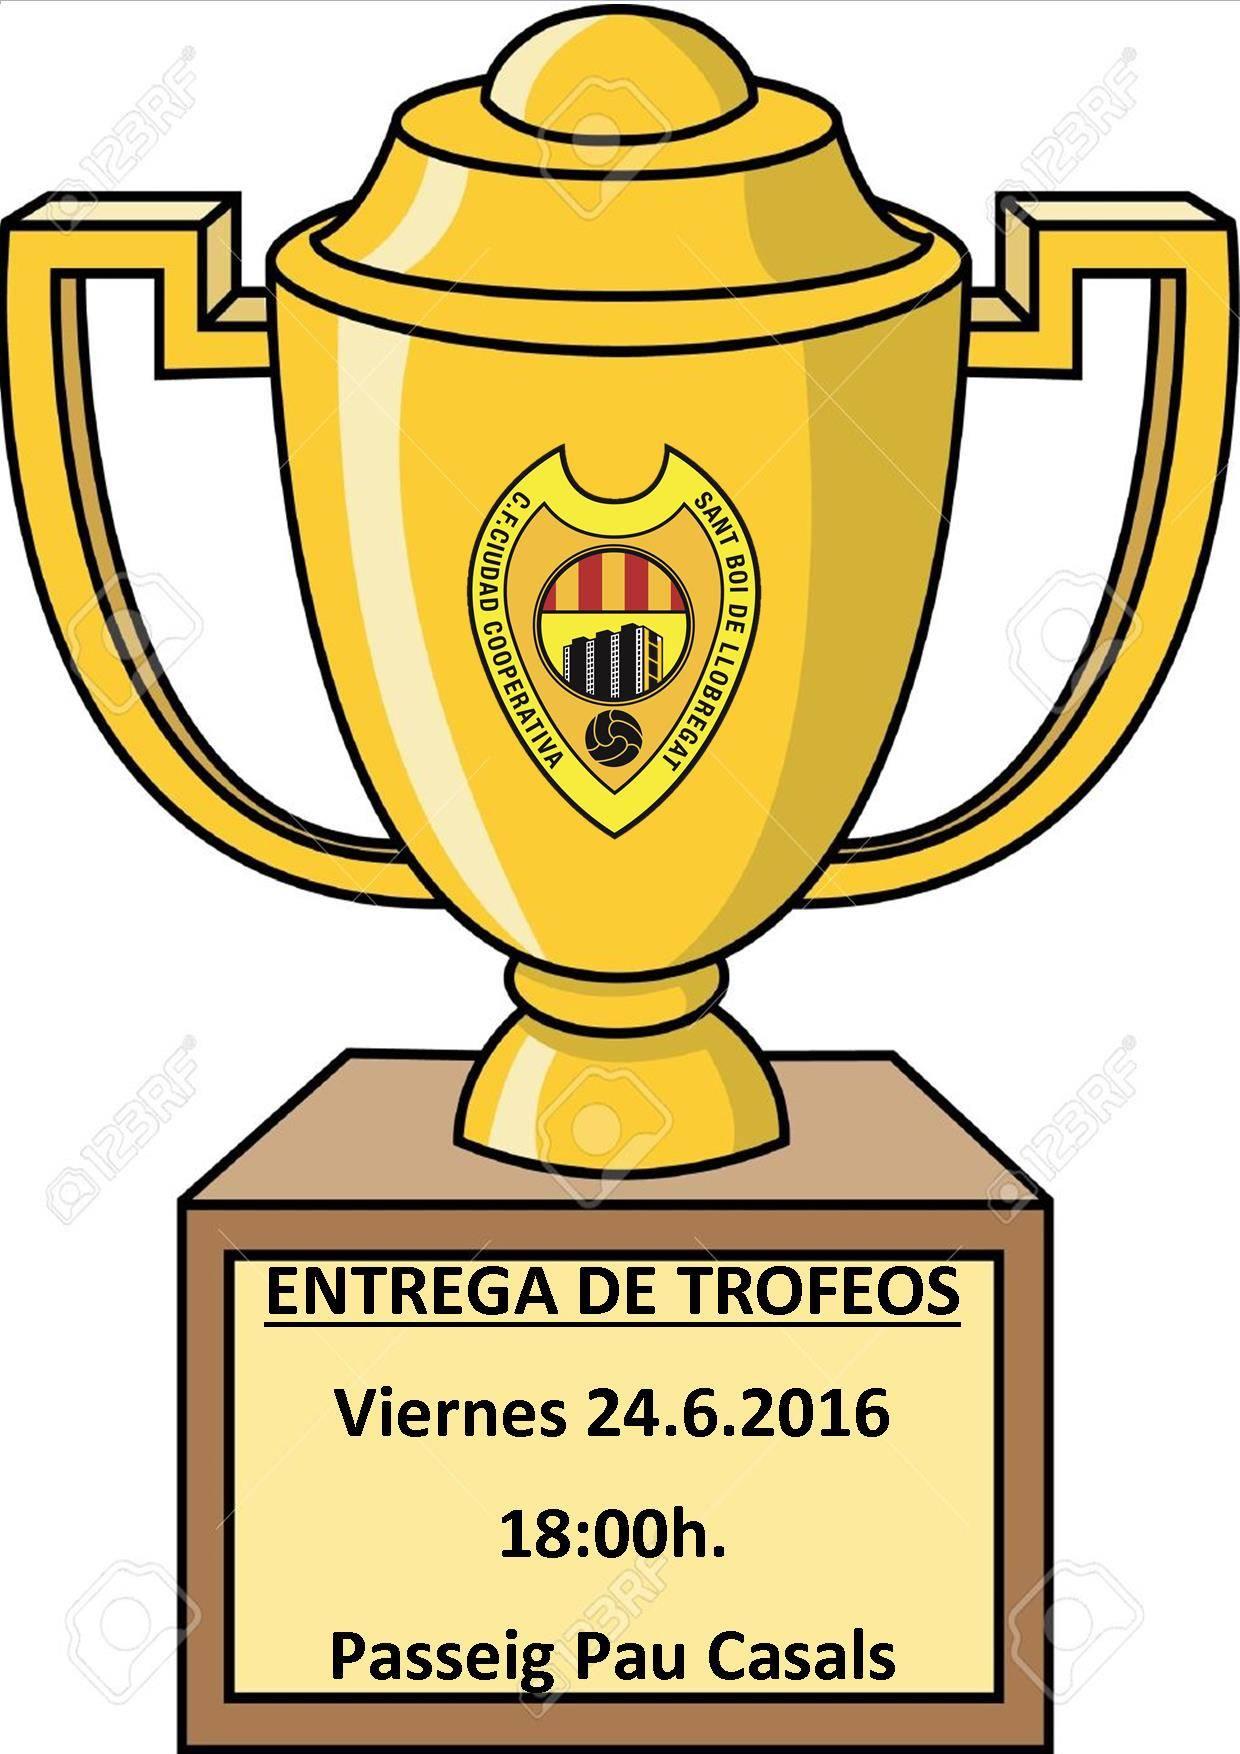 trofeos 16.jpg